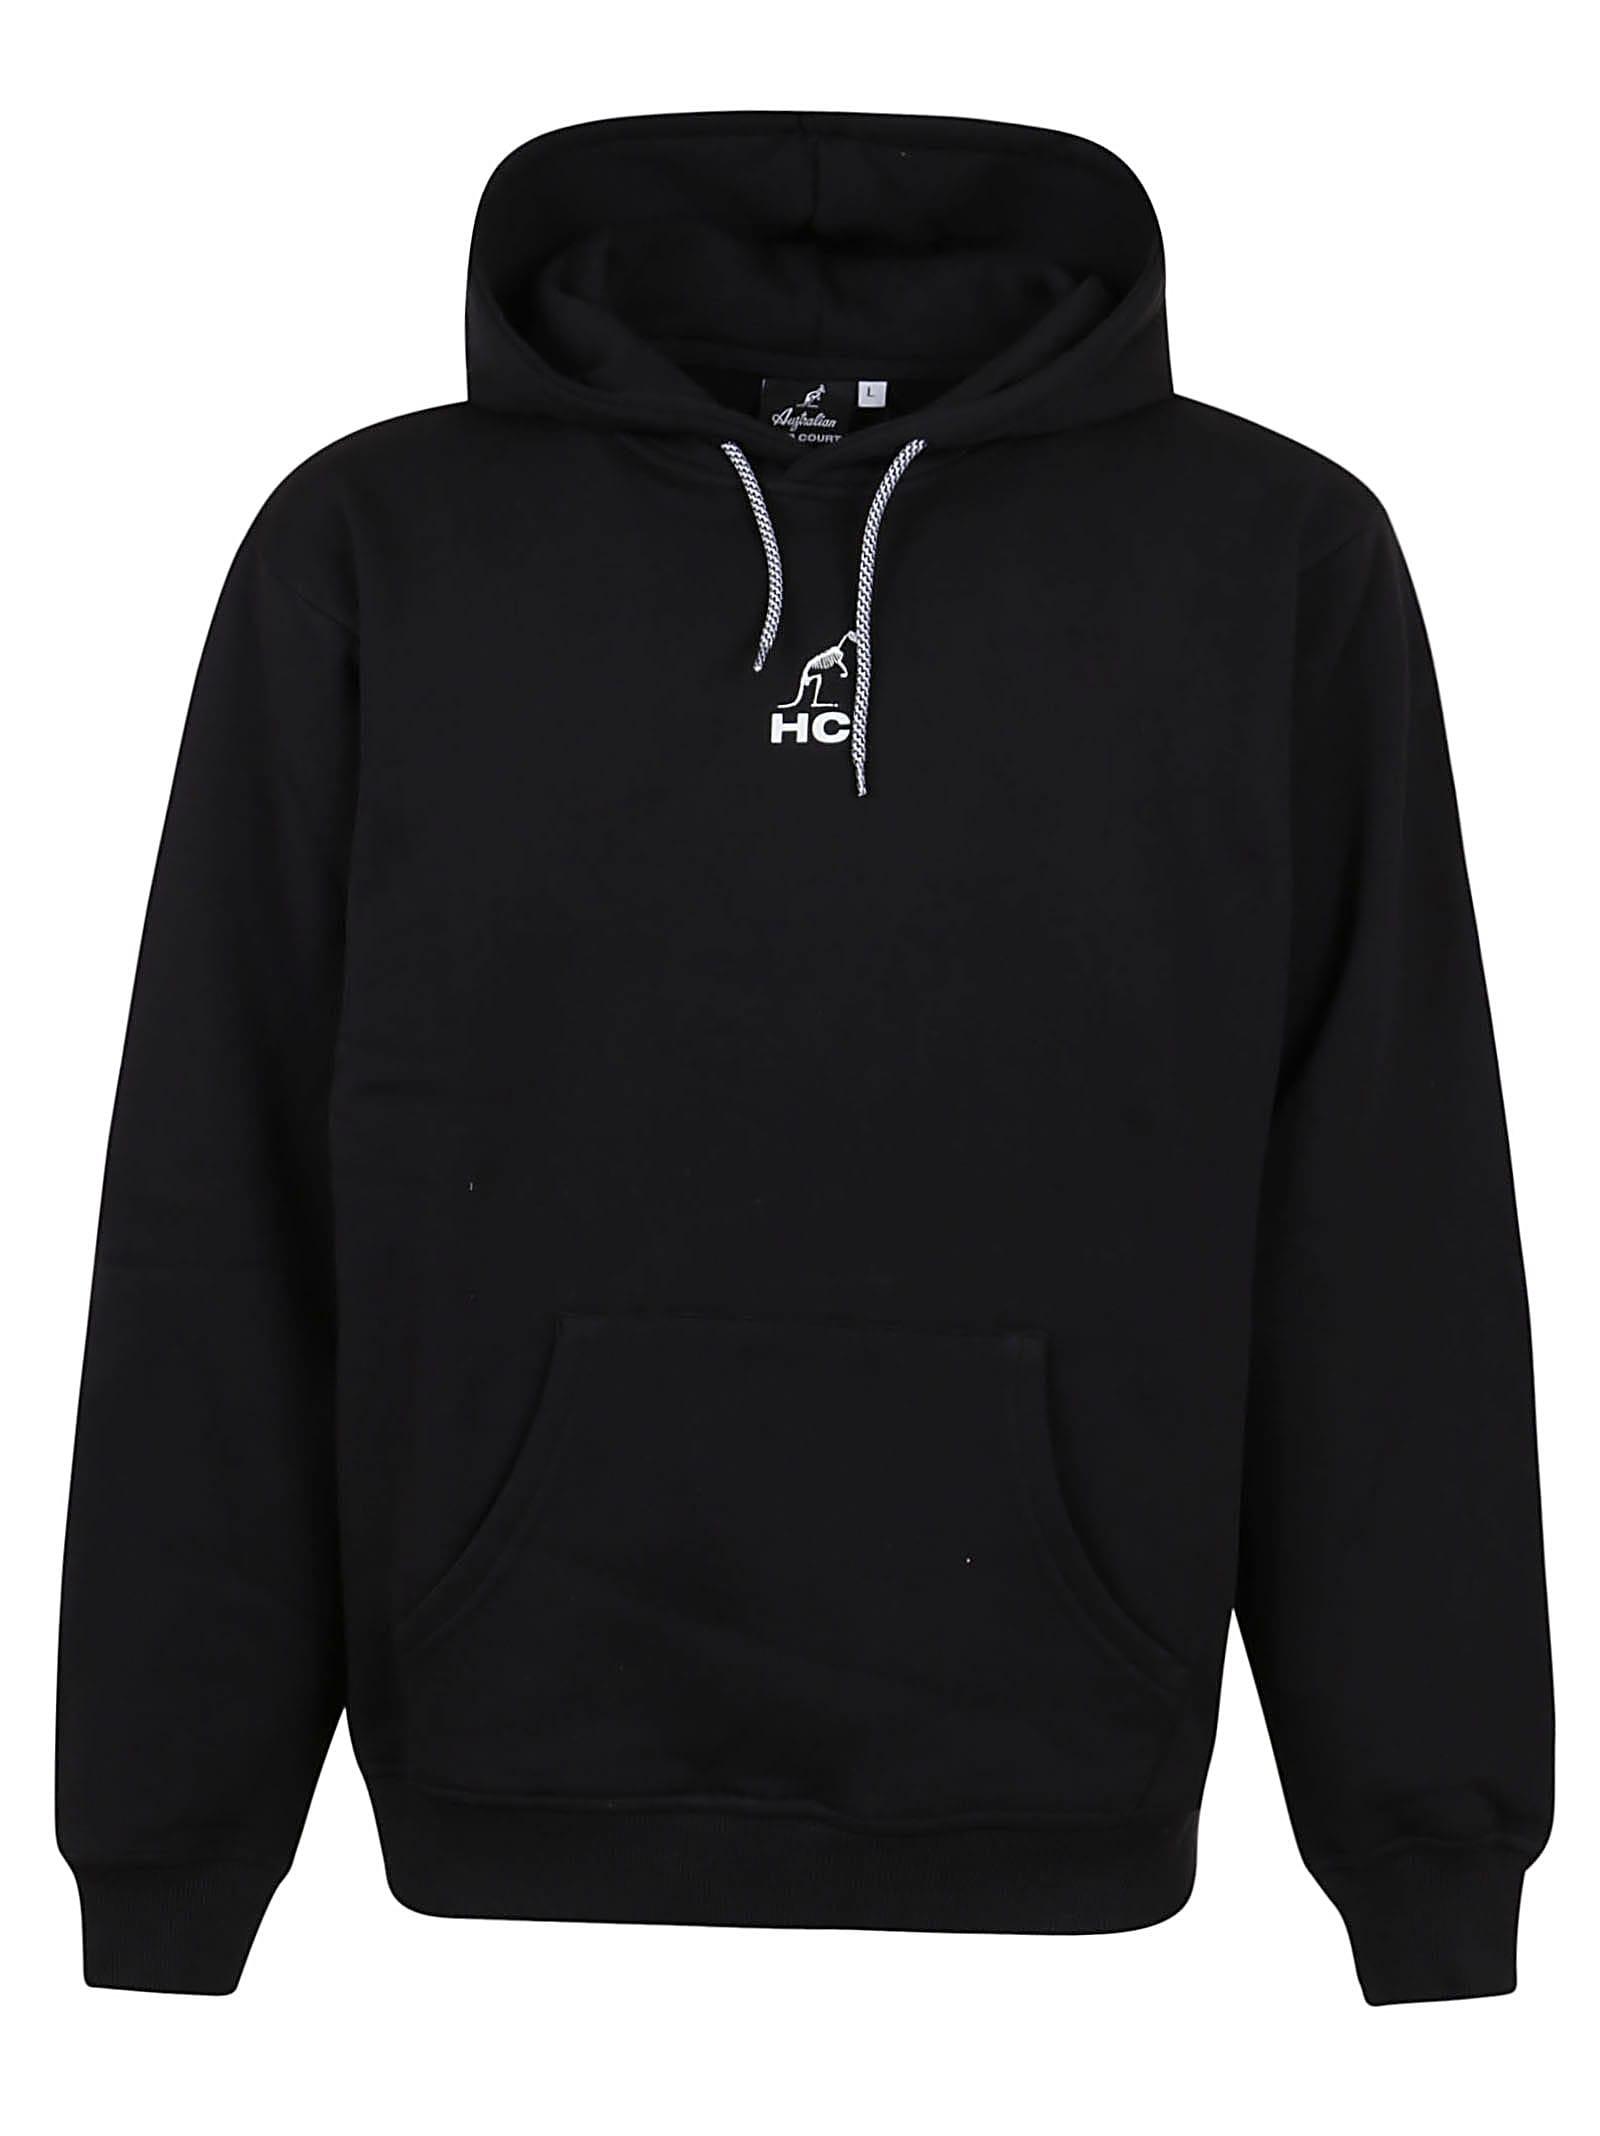 Hooded Sweatshirt With Bones Luminol Print